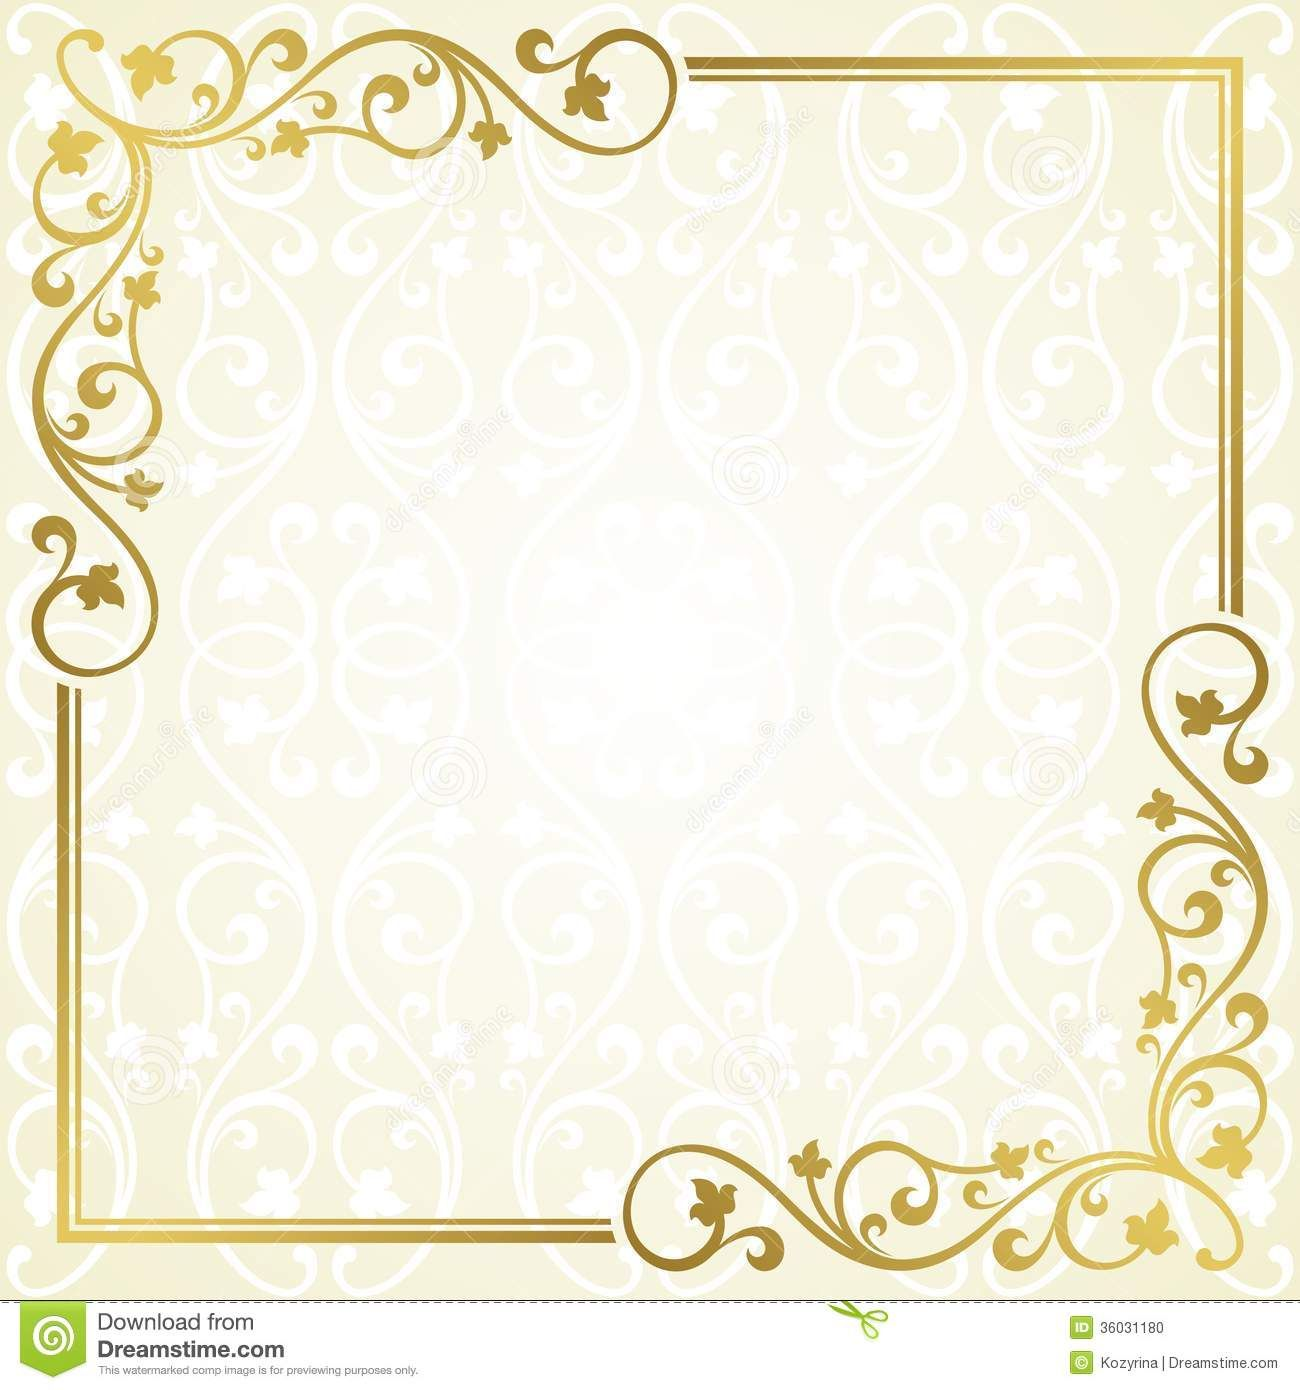 Related image Free invitation cards, Plain wedding